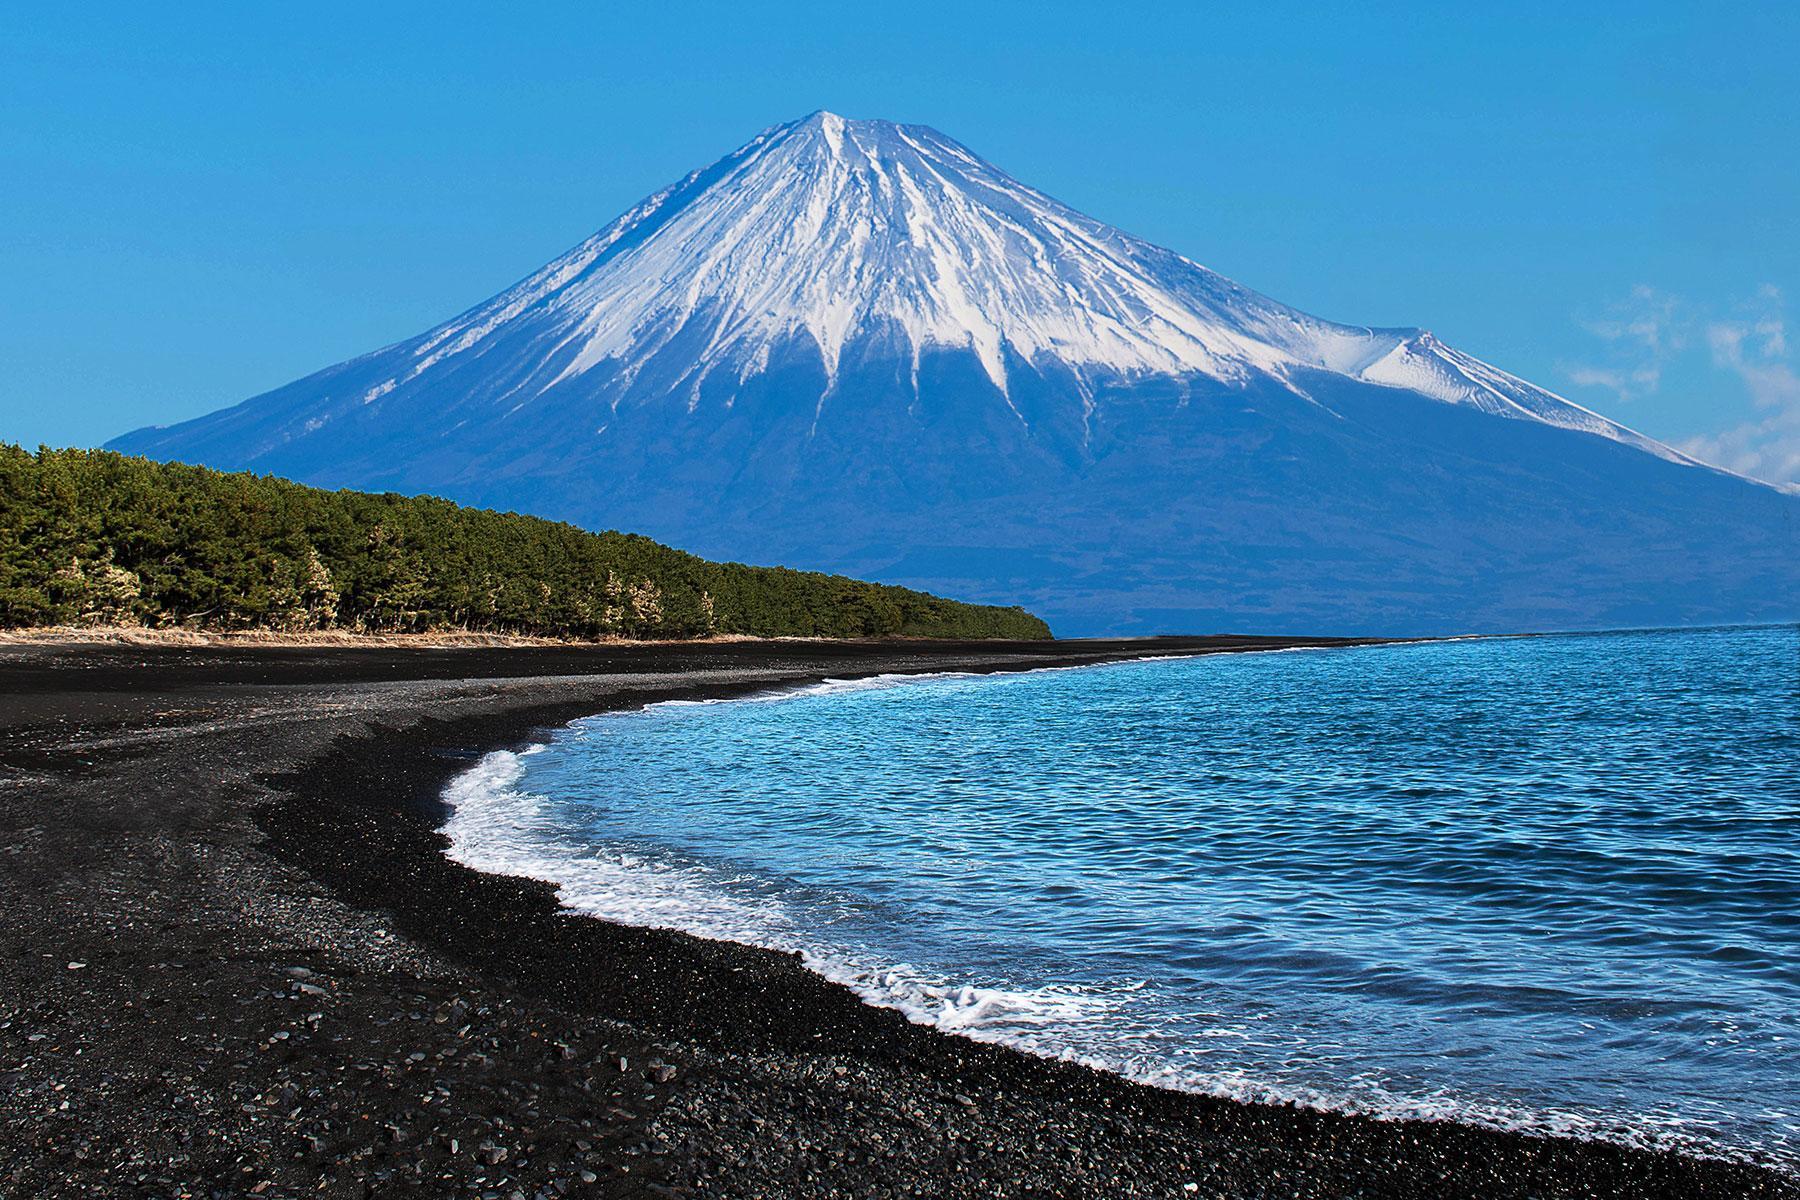 92dcde6c17d Black-Sand-Beaches-Miho-No-Matsubara-Shizuoka-Japan